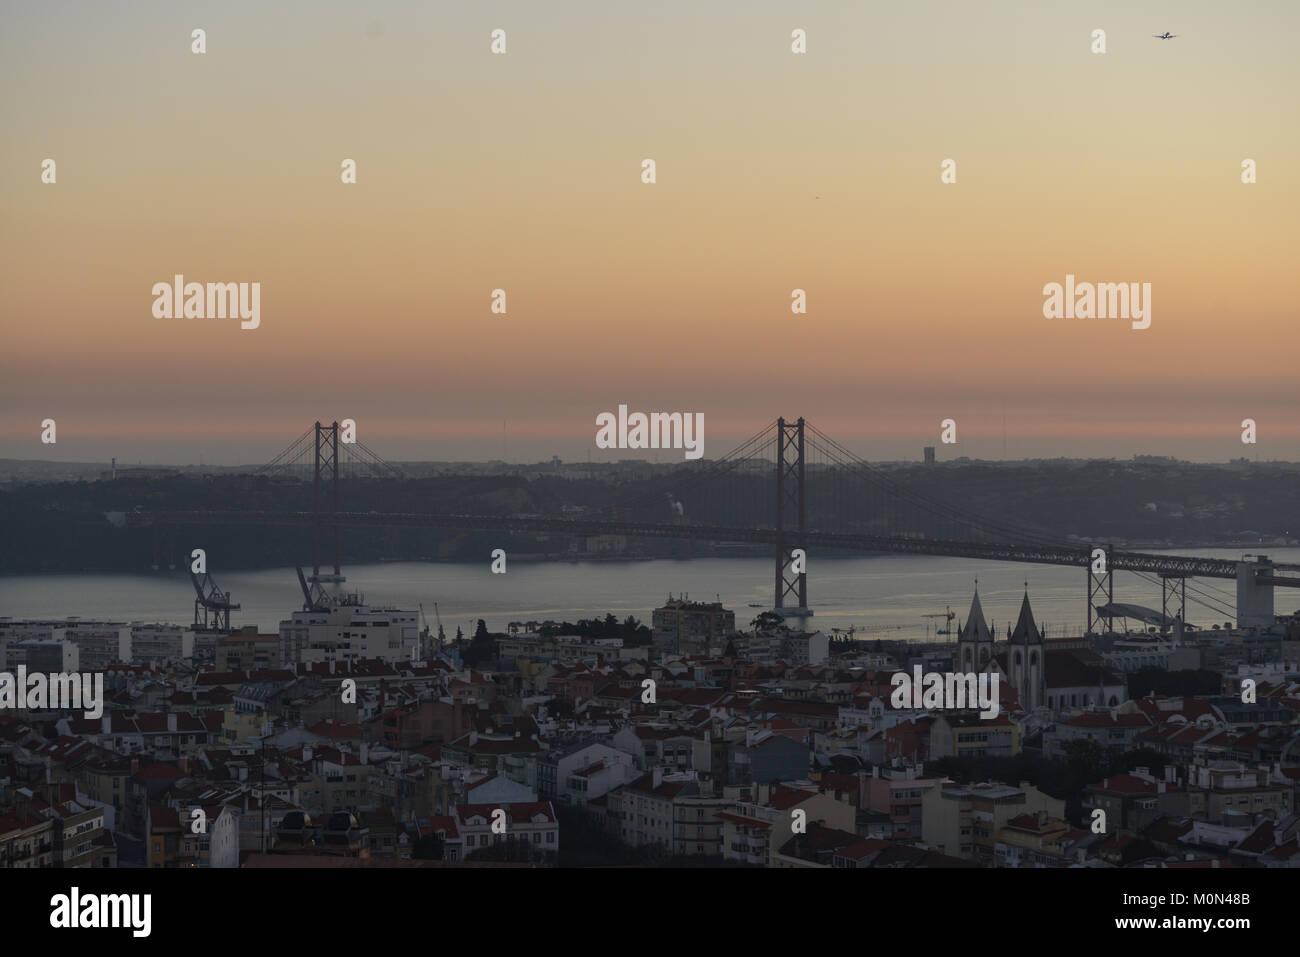 Lisbon, December 2017 - Stock Image